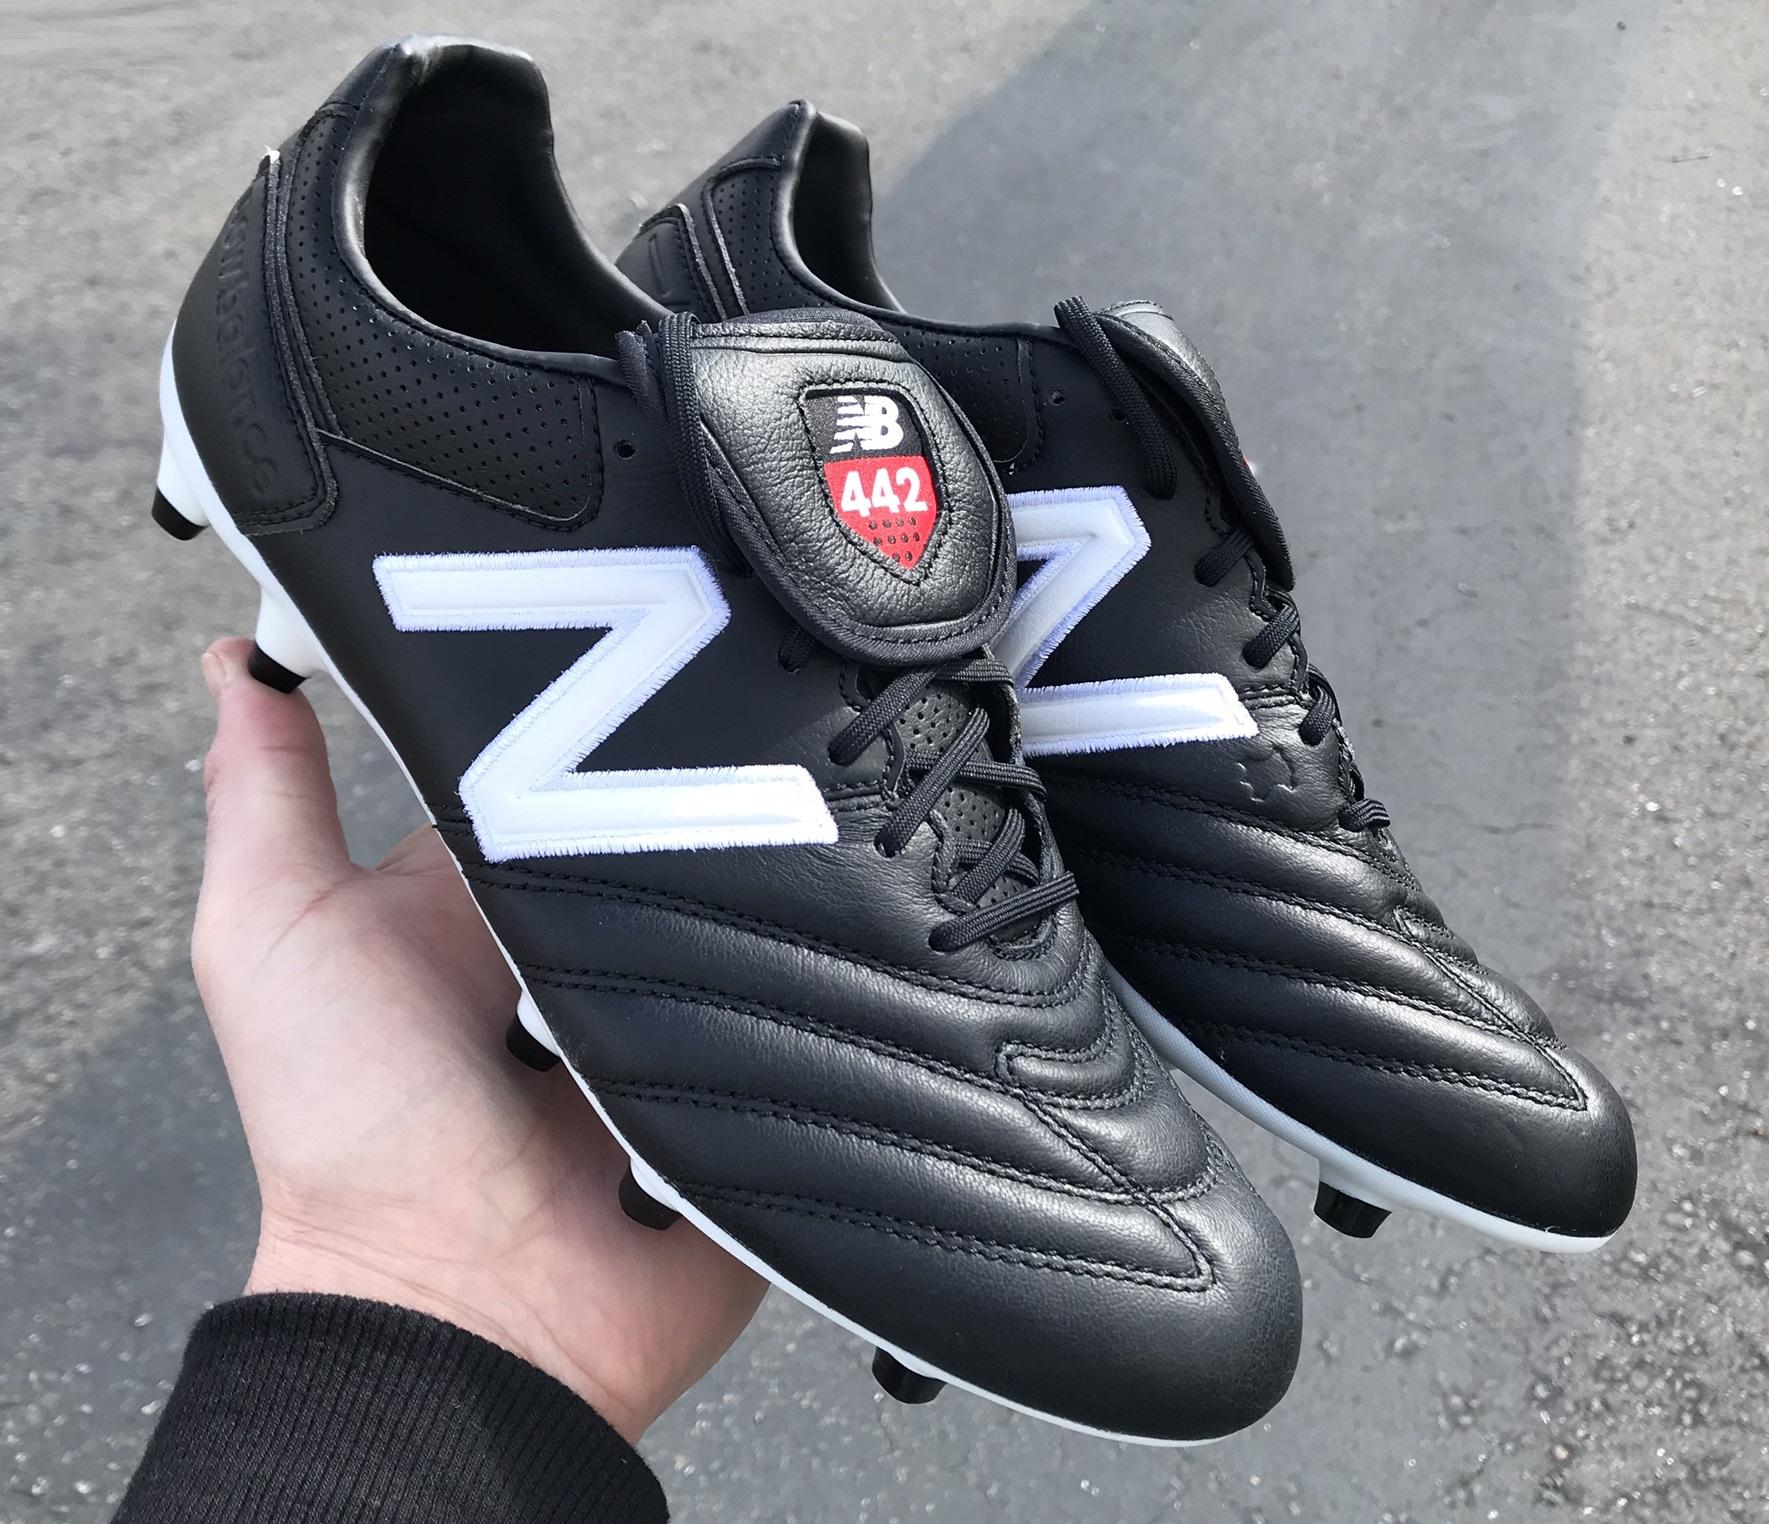 New Balance 442 | Soccer Cleats 101